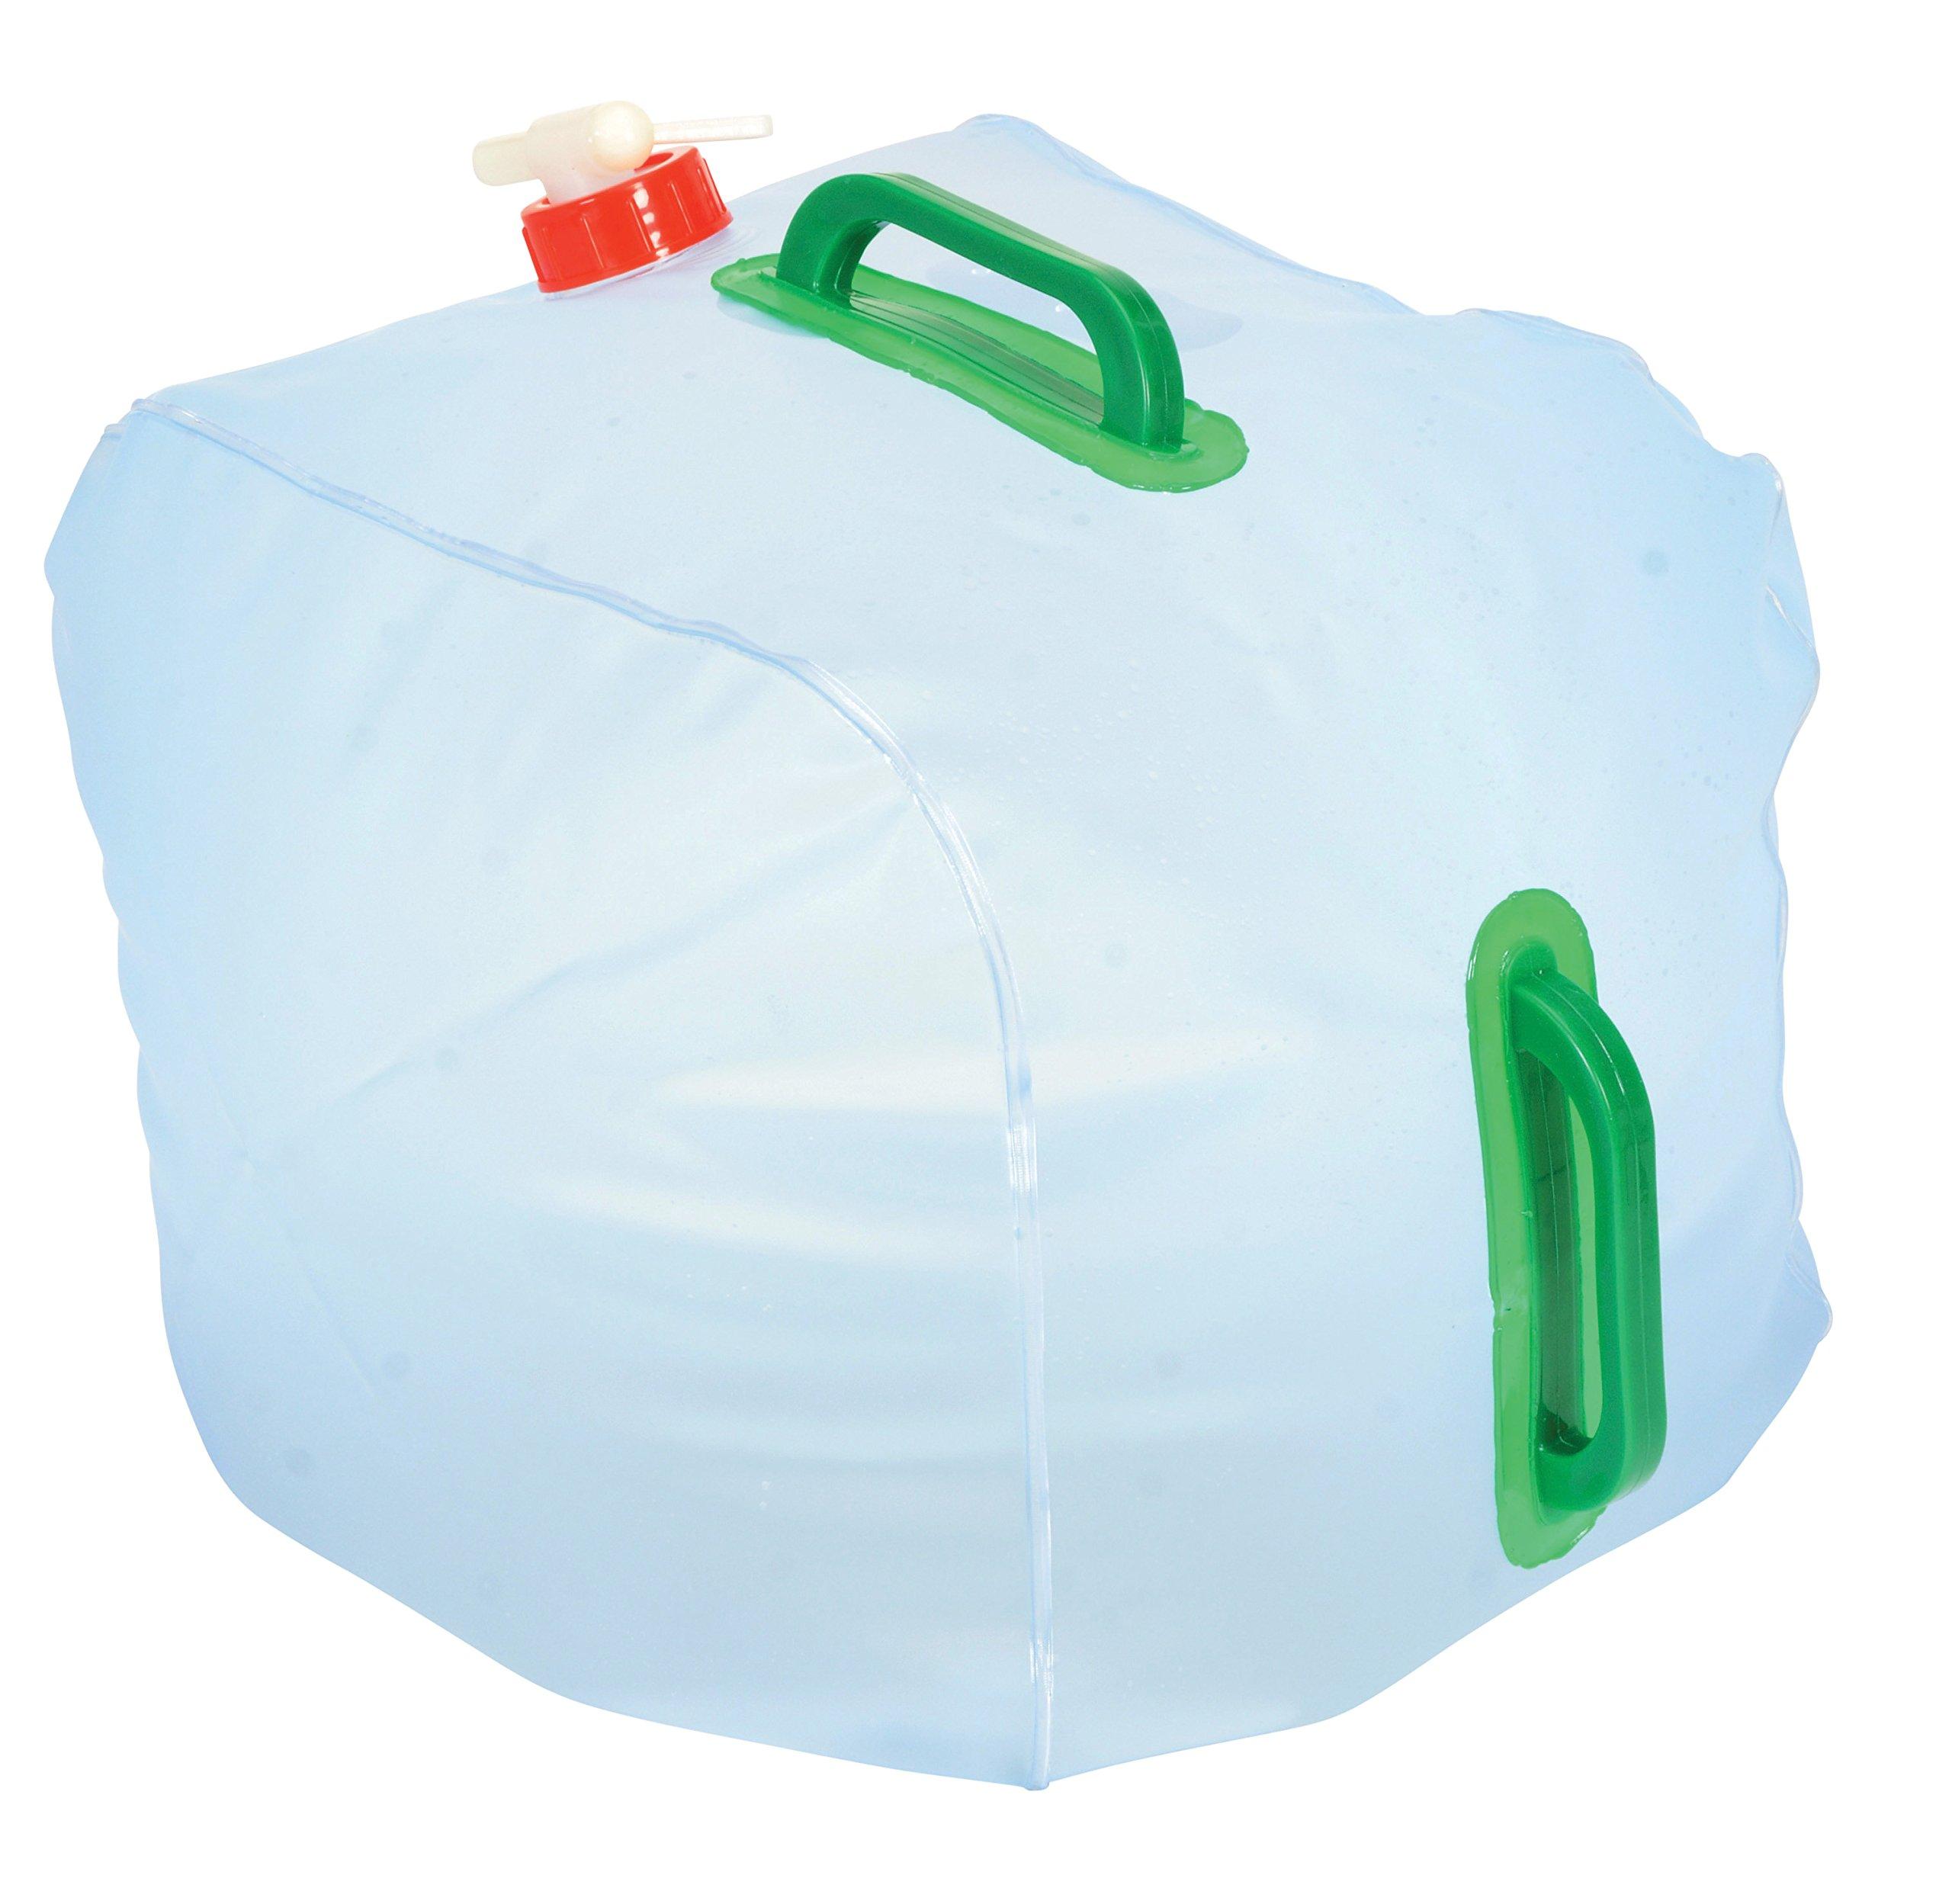 Vestil CARB-COL-50 High Density Polyethylene (HDPE) Round Collapsible Carboy with 3/4'' Polyethylene Spigot, 5 Gallon Capacity, Natural